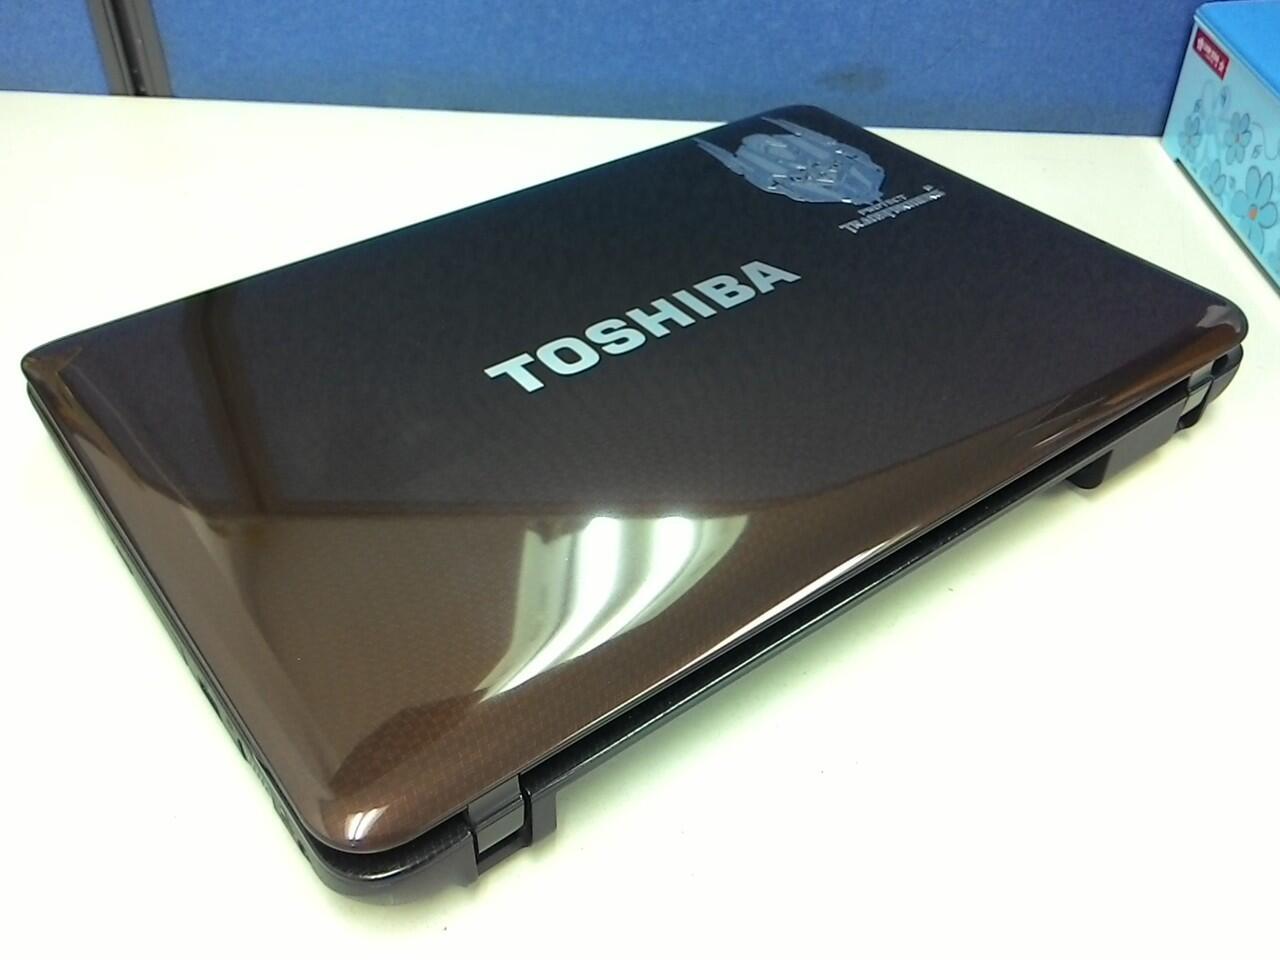 Jual Toshiba Satelite L645